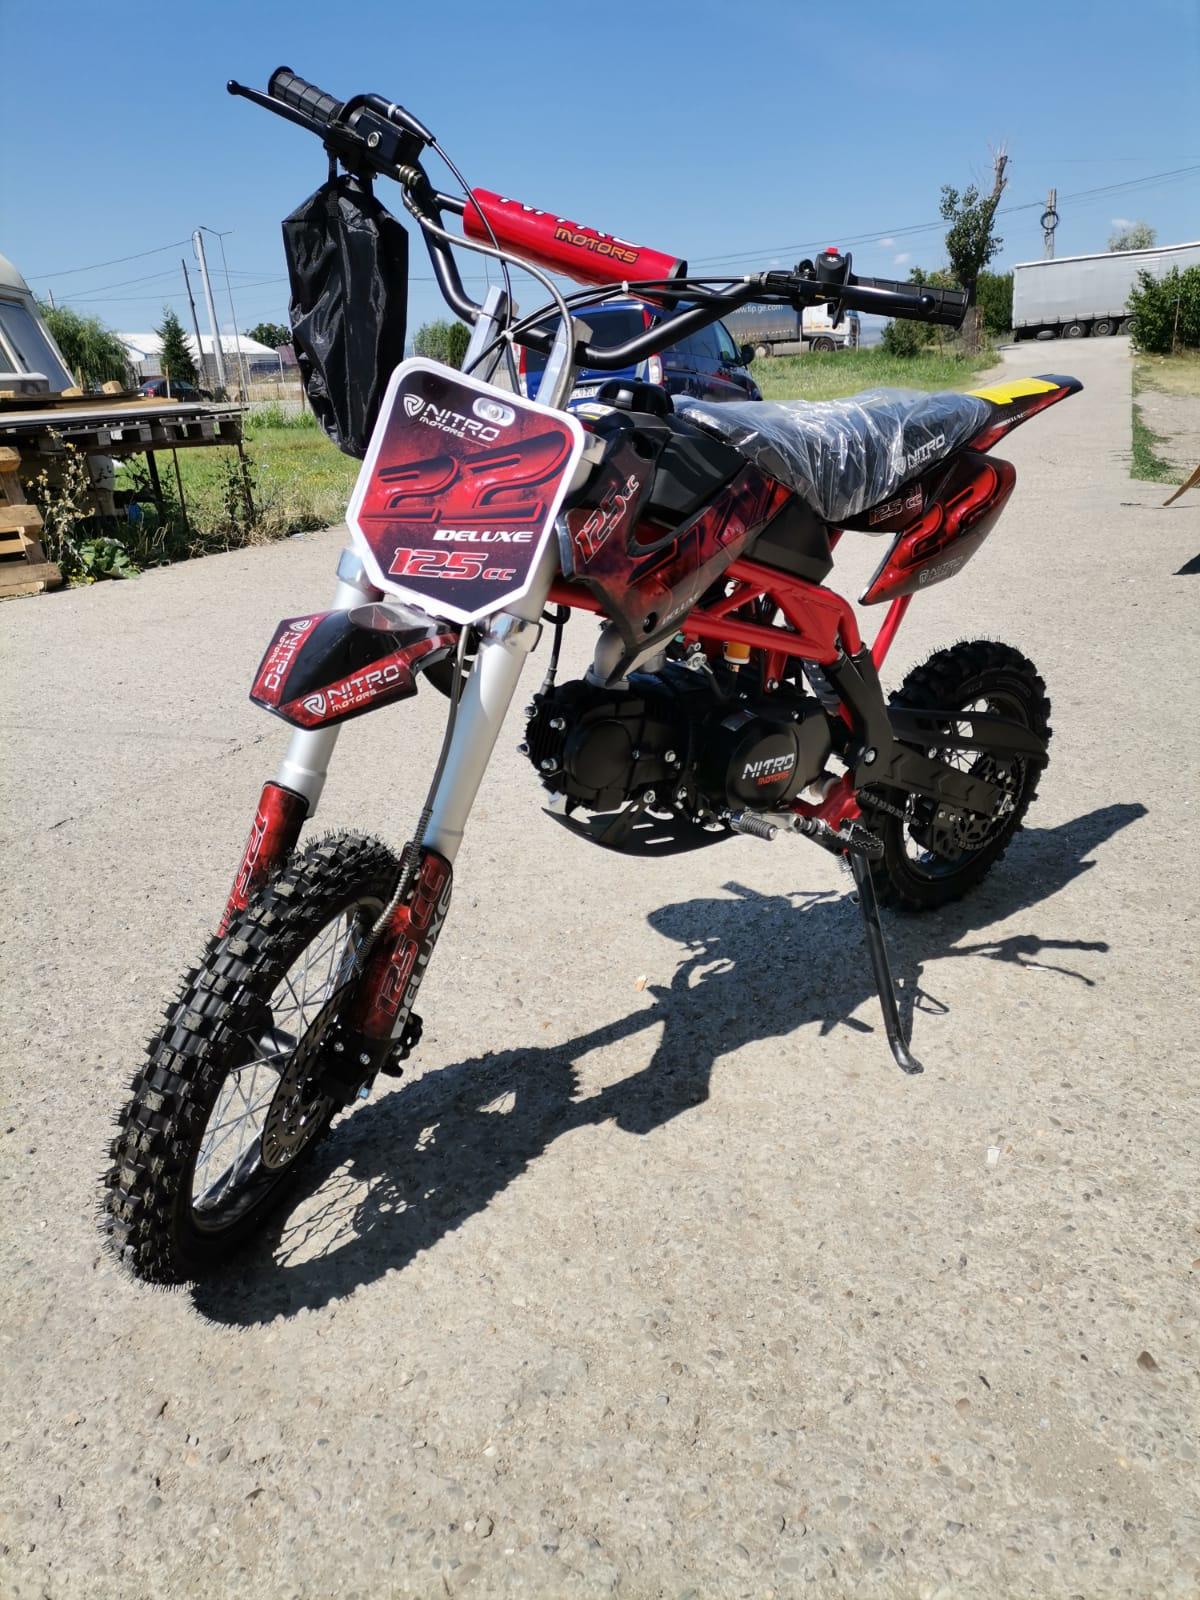 MOTOCICLETA SKY DELUXE 125CC #MANUALA 4 TREPTE